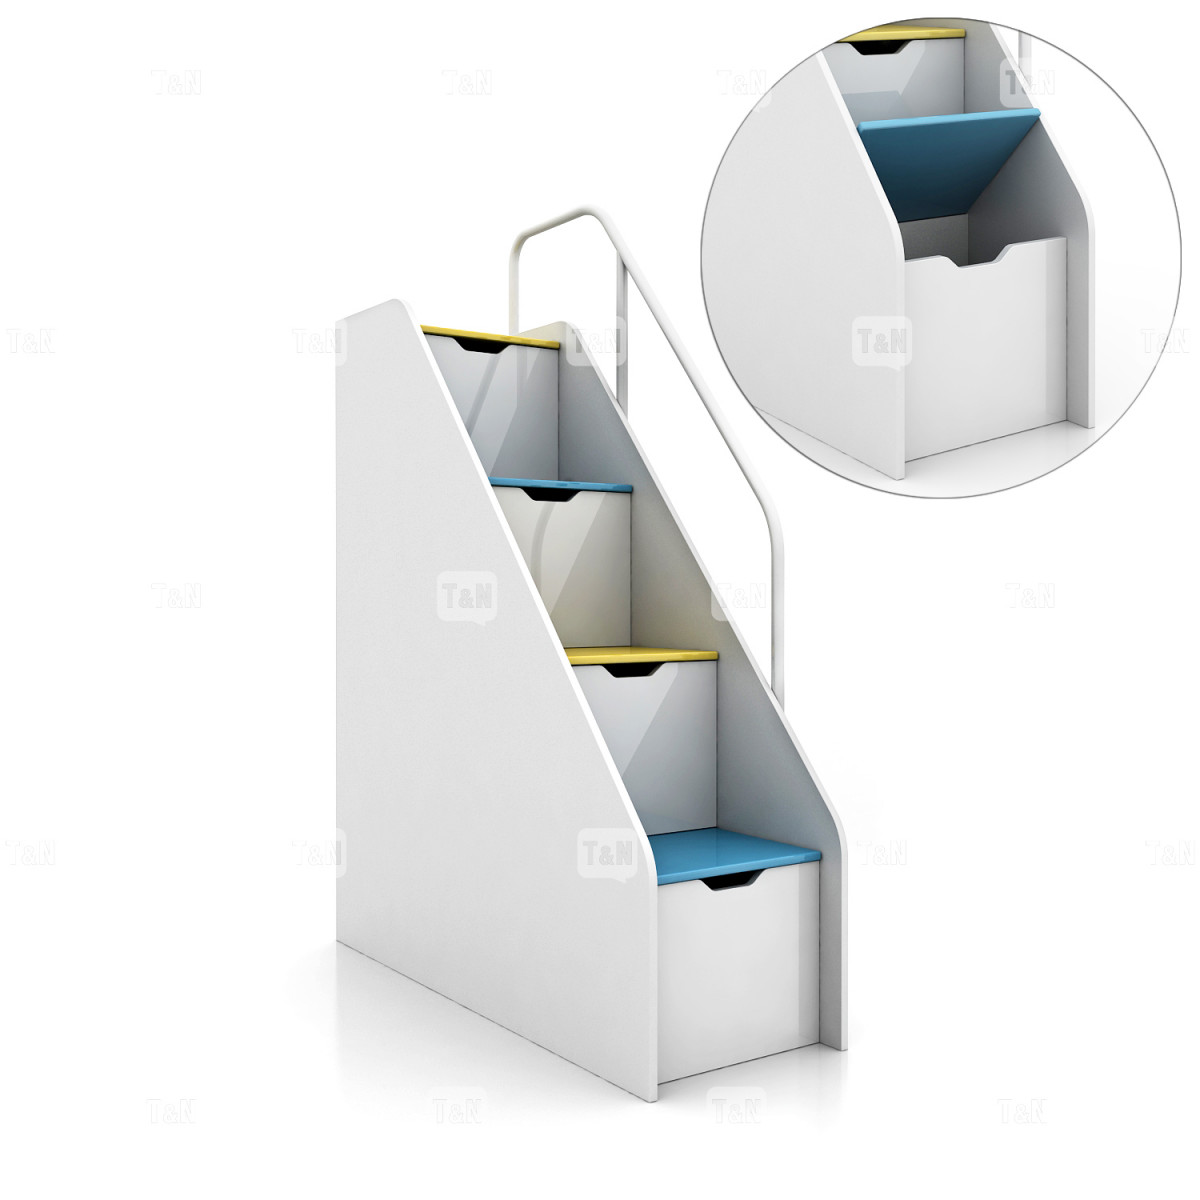 Лестница со ступеньками-ящиками для двухъярусной кровати (Фабрика TOMY NIKI )